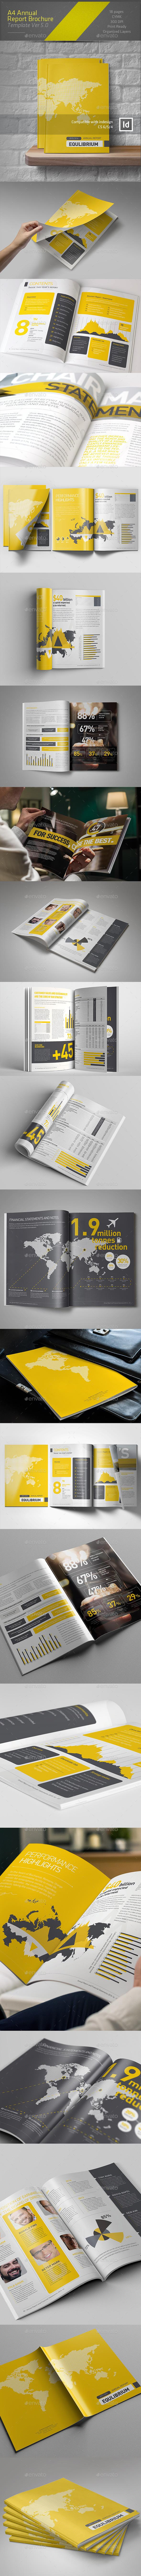 Annual Report Brochure Ver 5.0 - Corporate Brochures